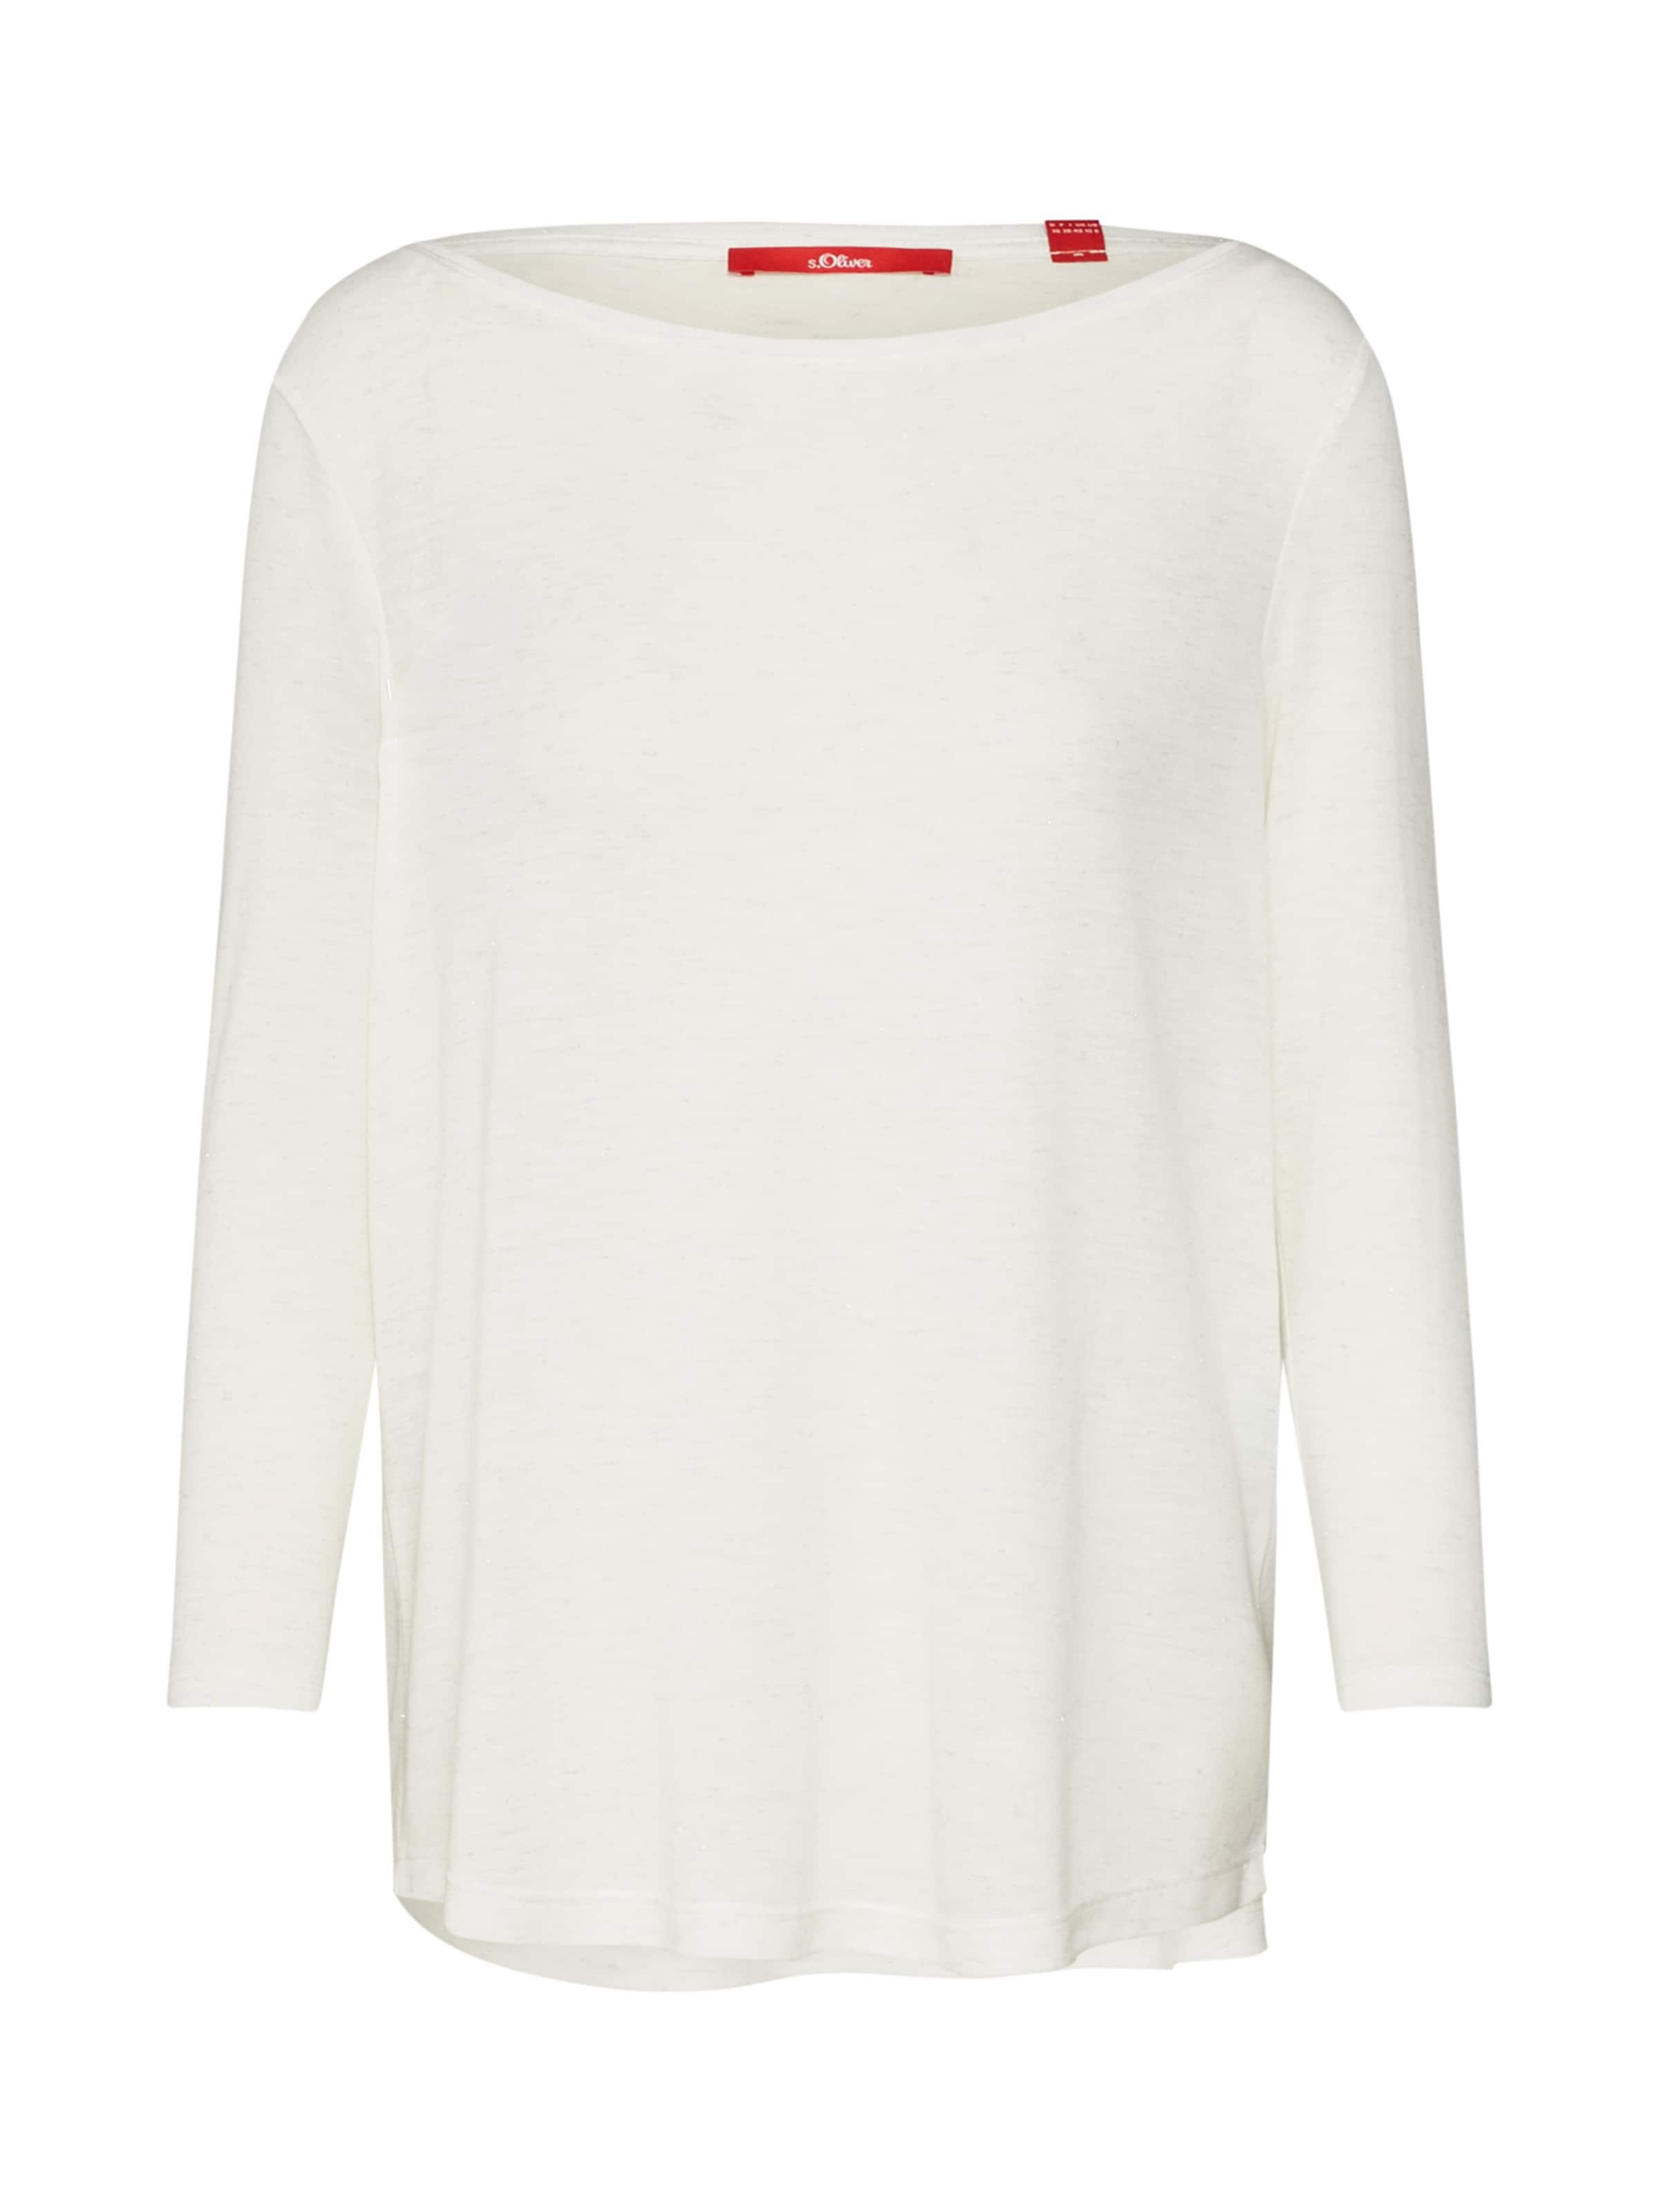 oliver Creme In oliver S S Shirt In Shirt In Creme Shirt S oliver c4q3jSRL5A